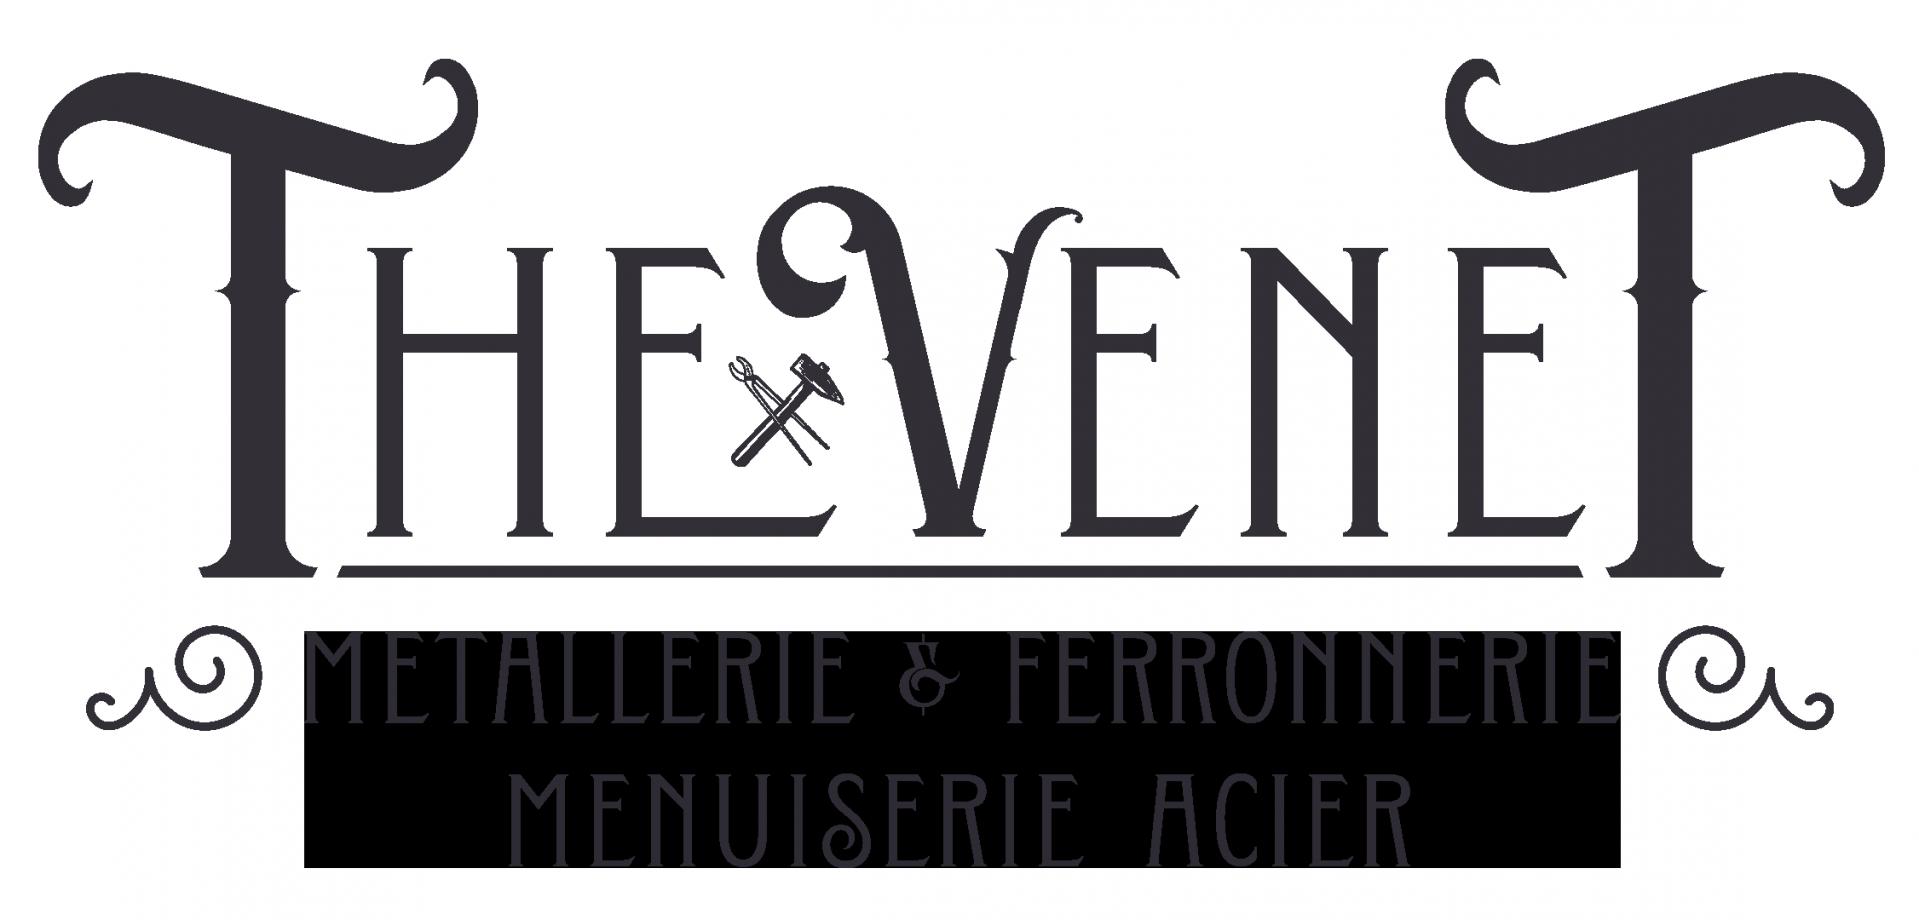 Logo Thevenet Pere et Fils